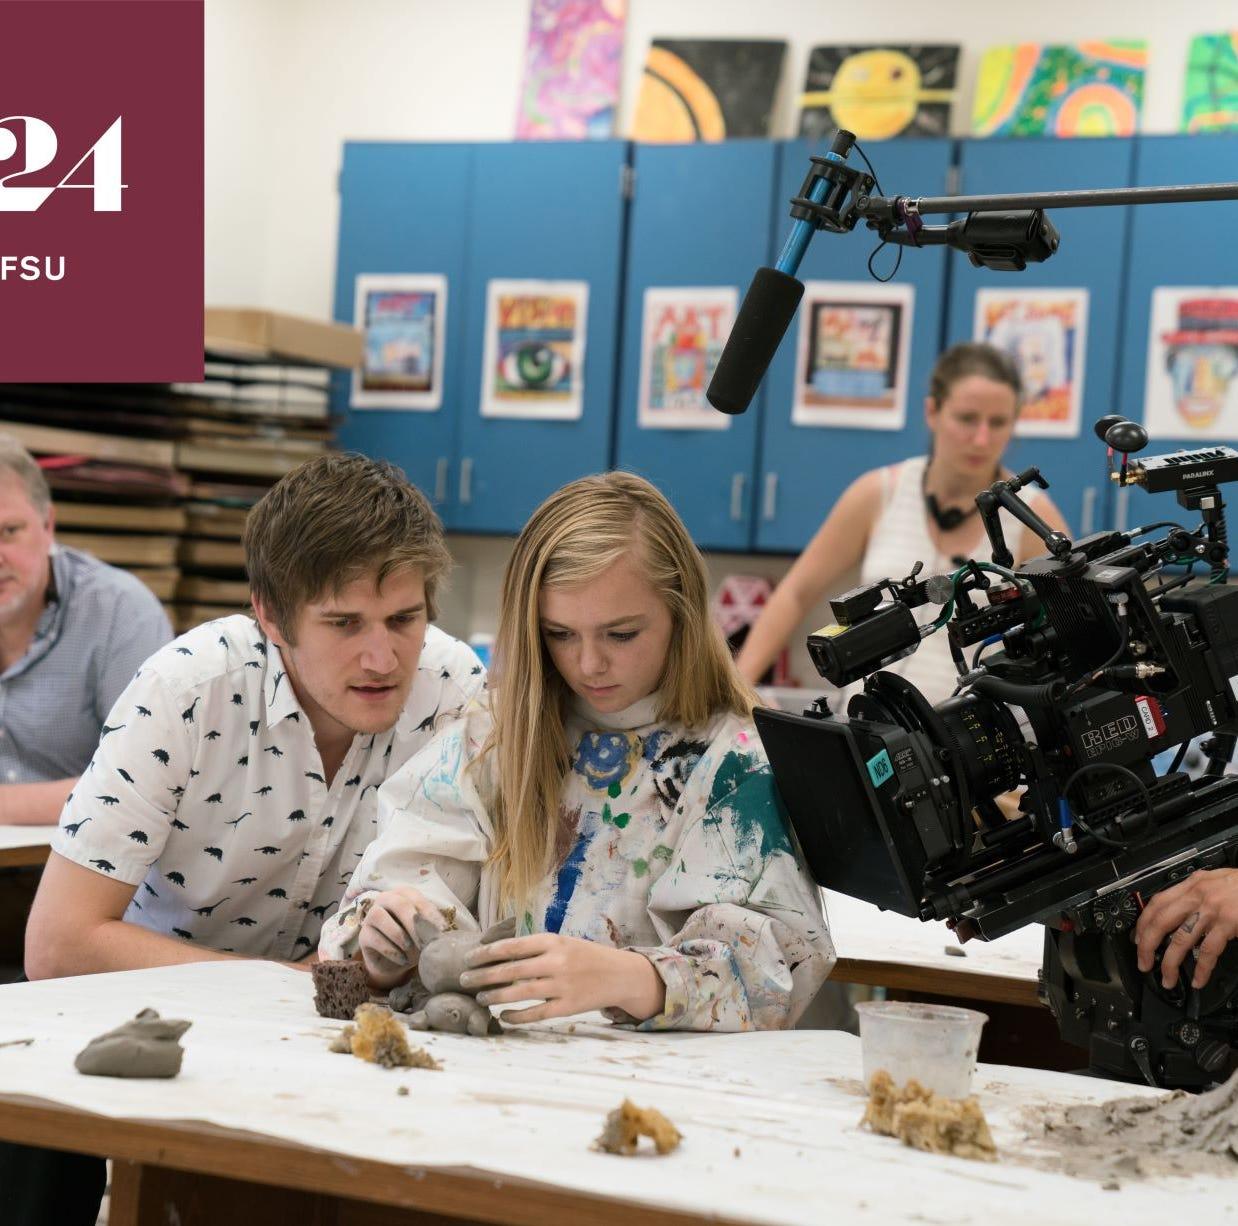 Popular film distributor A24 brings independent cinema to FSU community